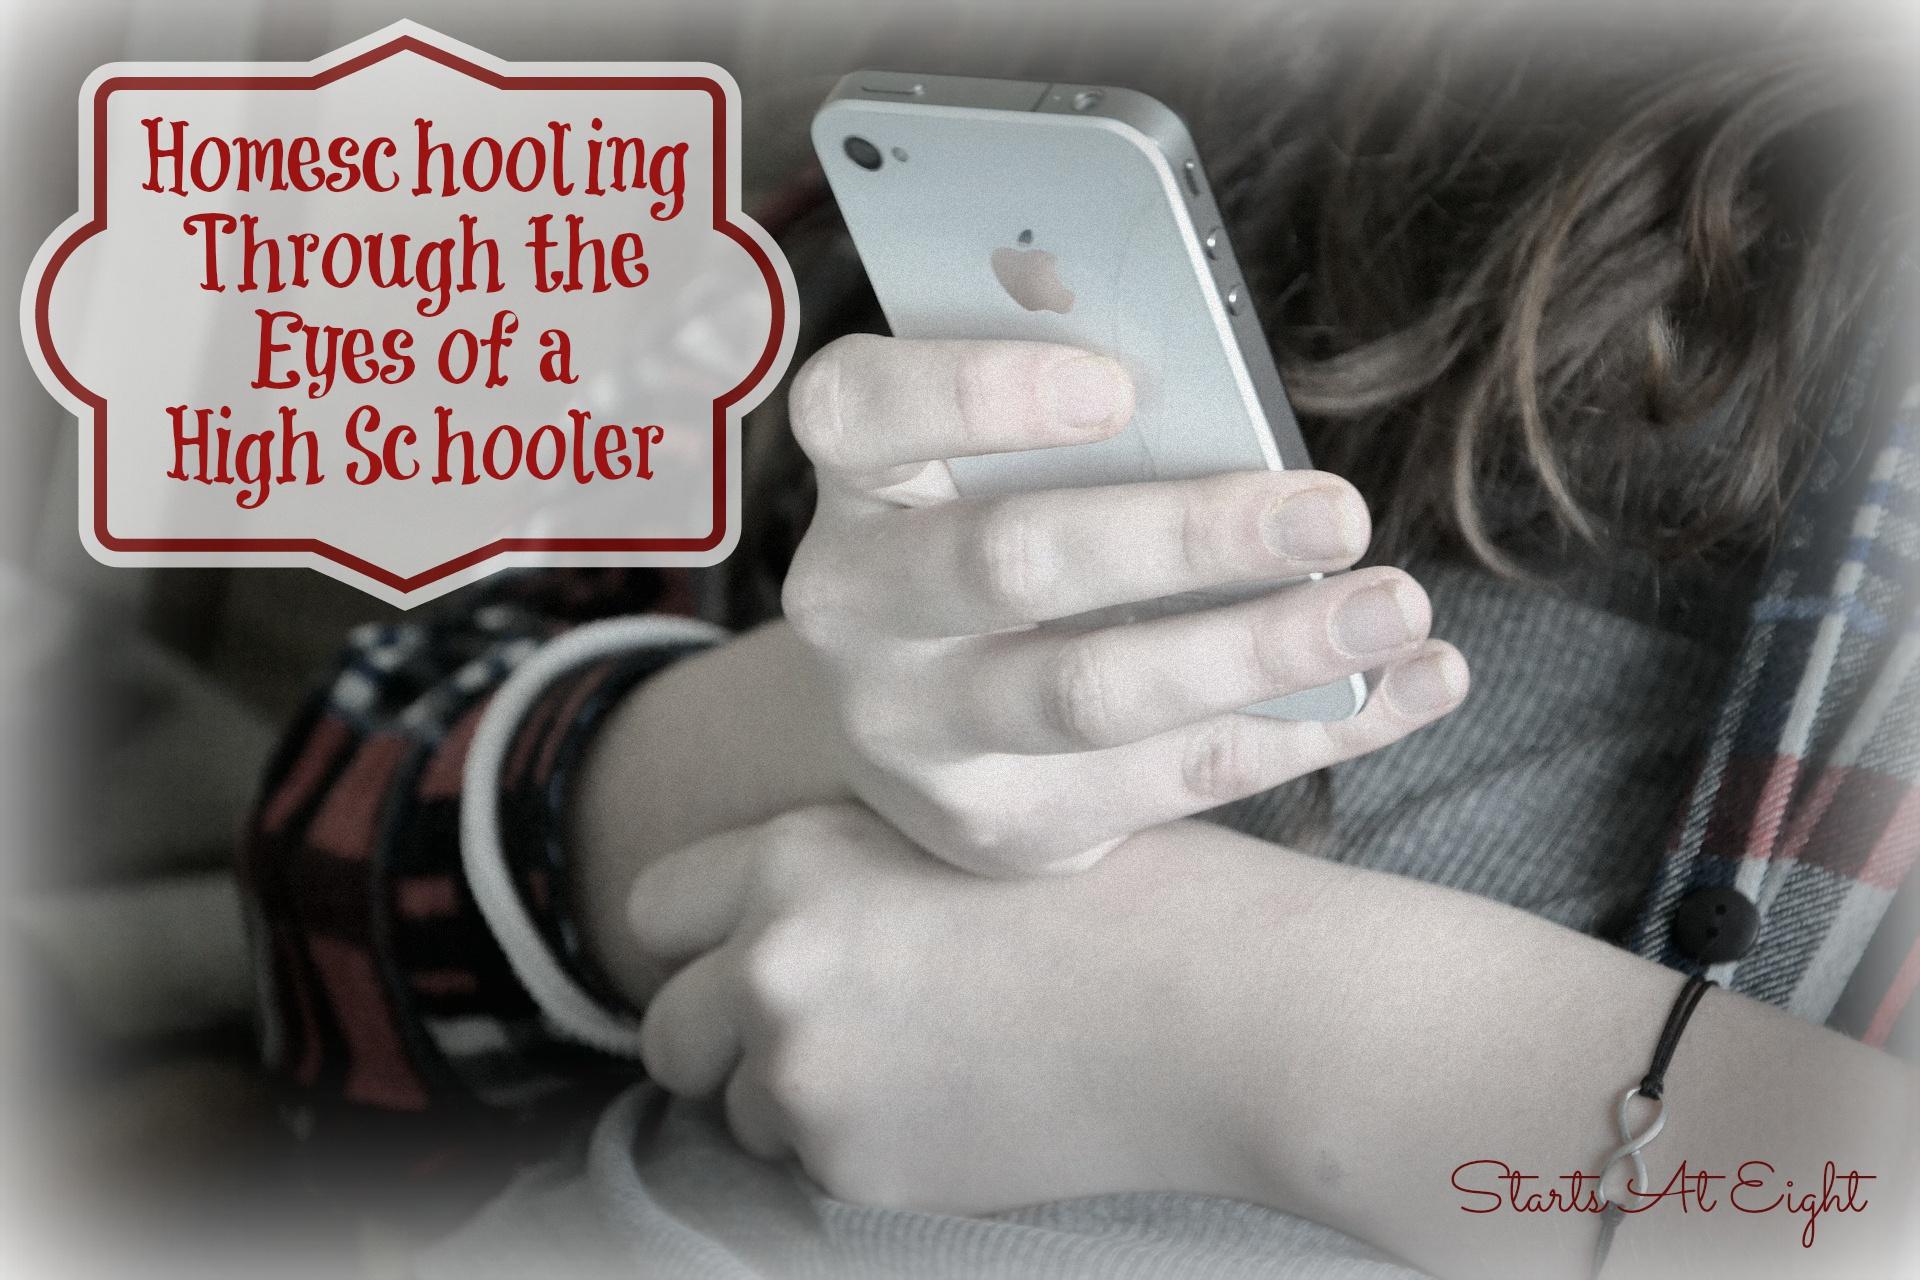 Homeschooling Through the Eyes of a High Schooler